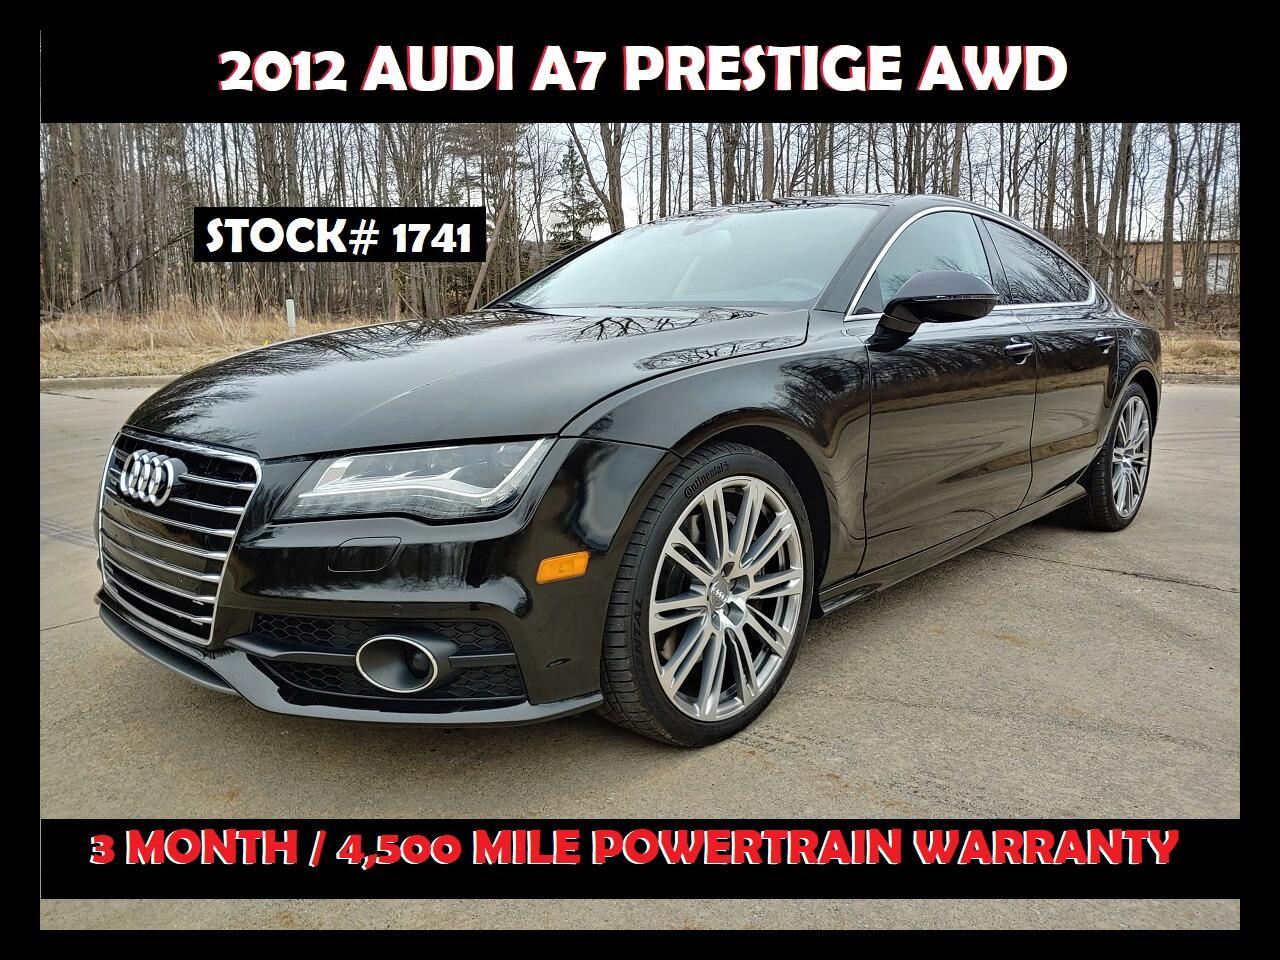 Audi A7 4dr HB quattro 3.0 Prestige 2012